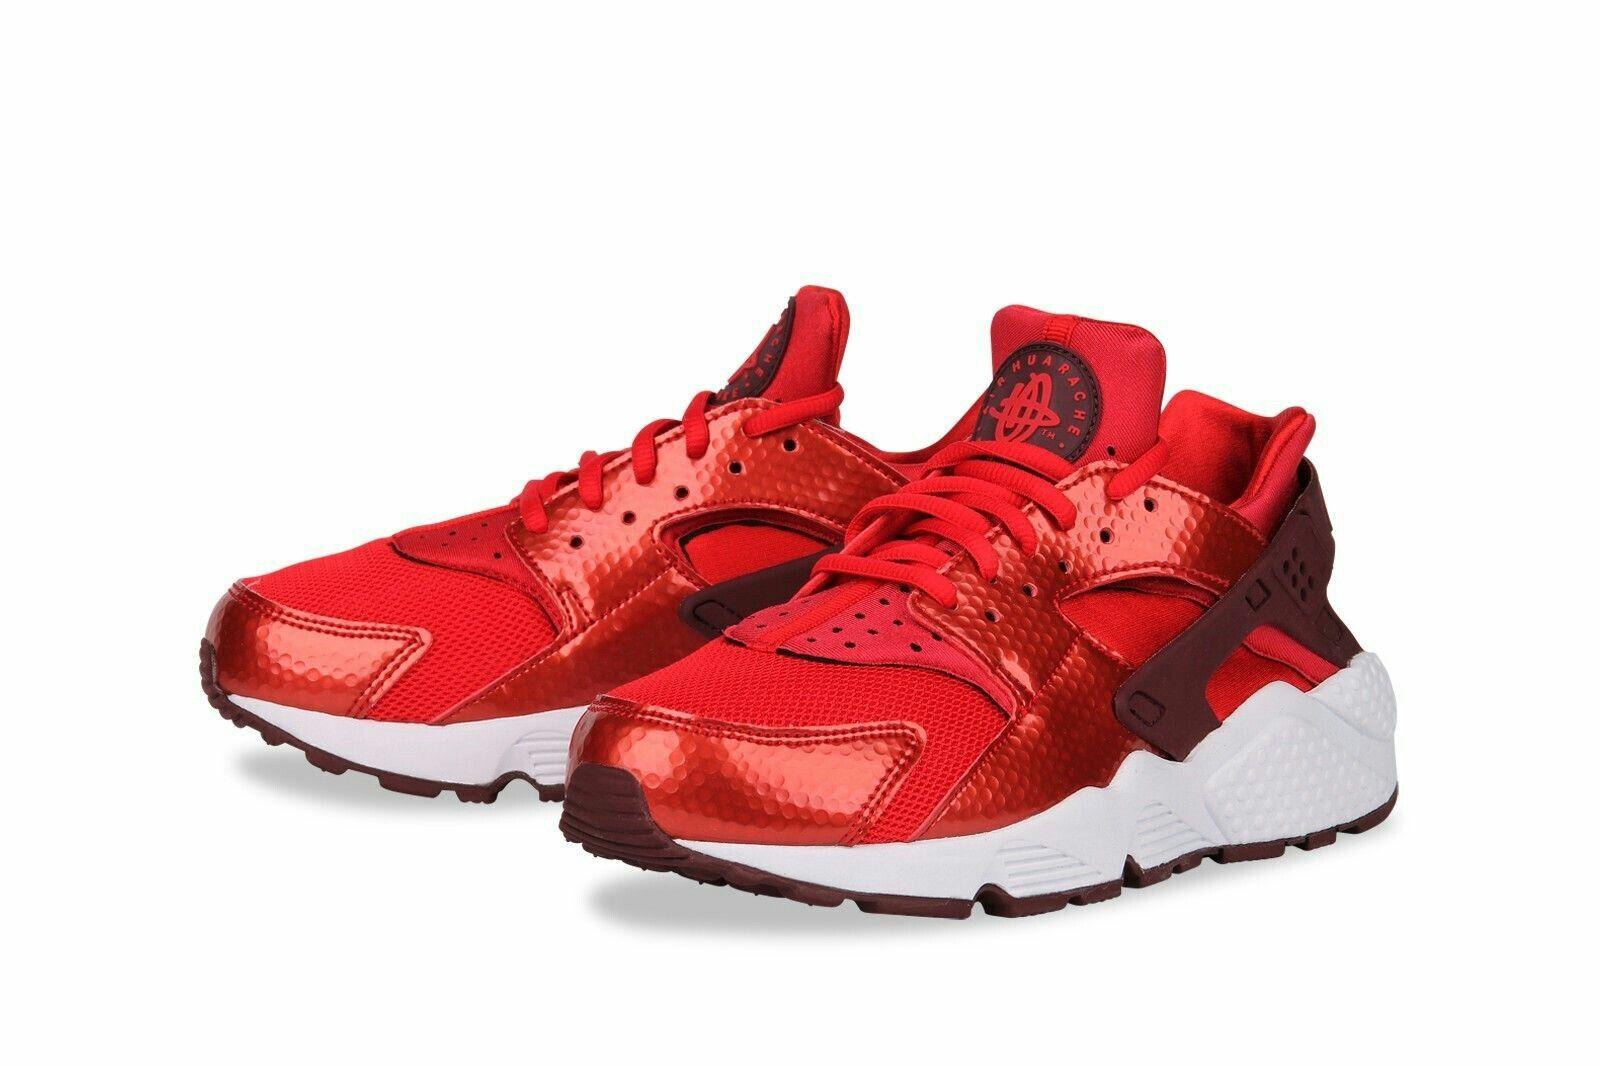 Womens Nike Air Huarache Run Trainers Red Size UK 4 EUR 37.5